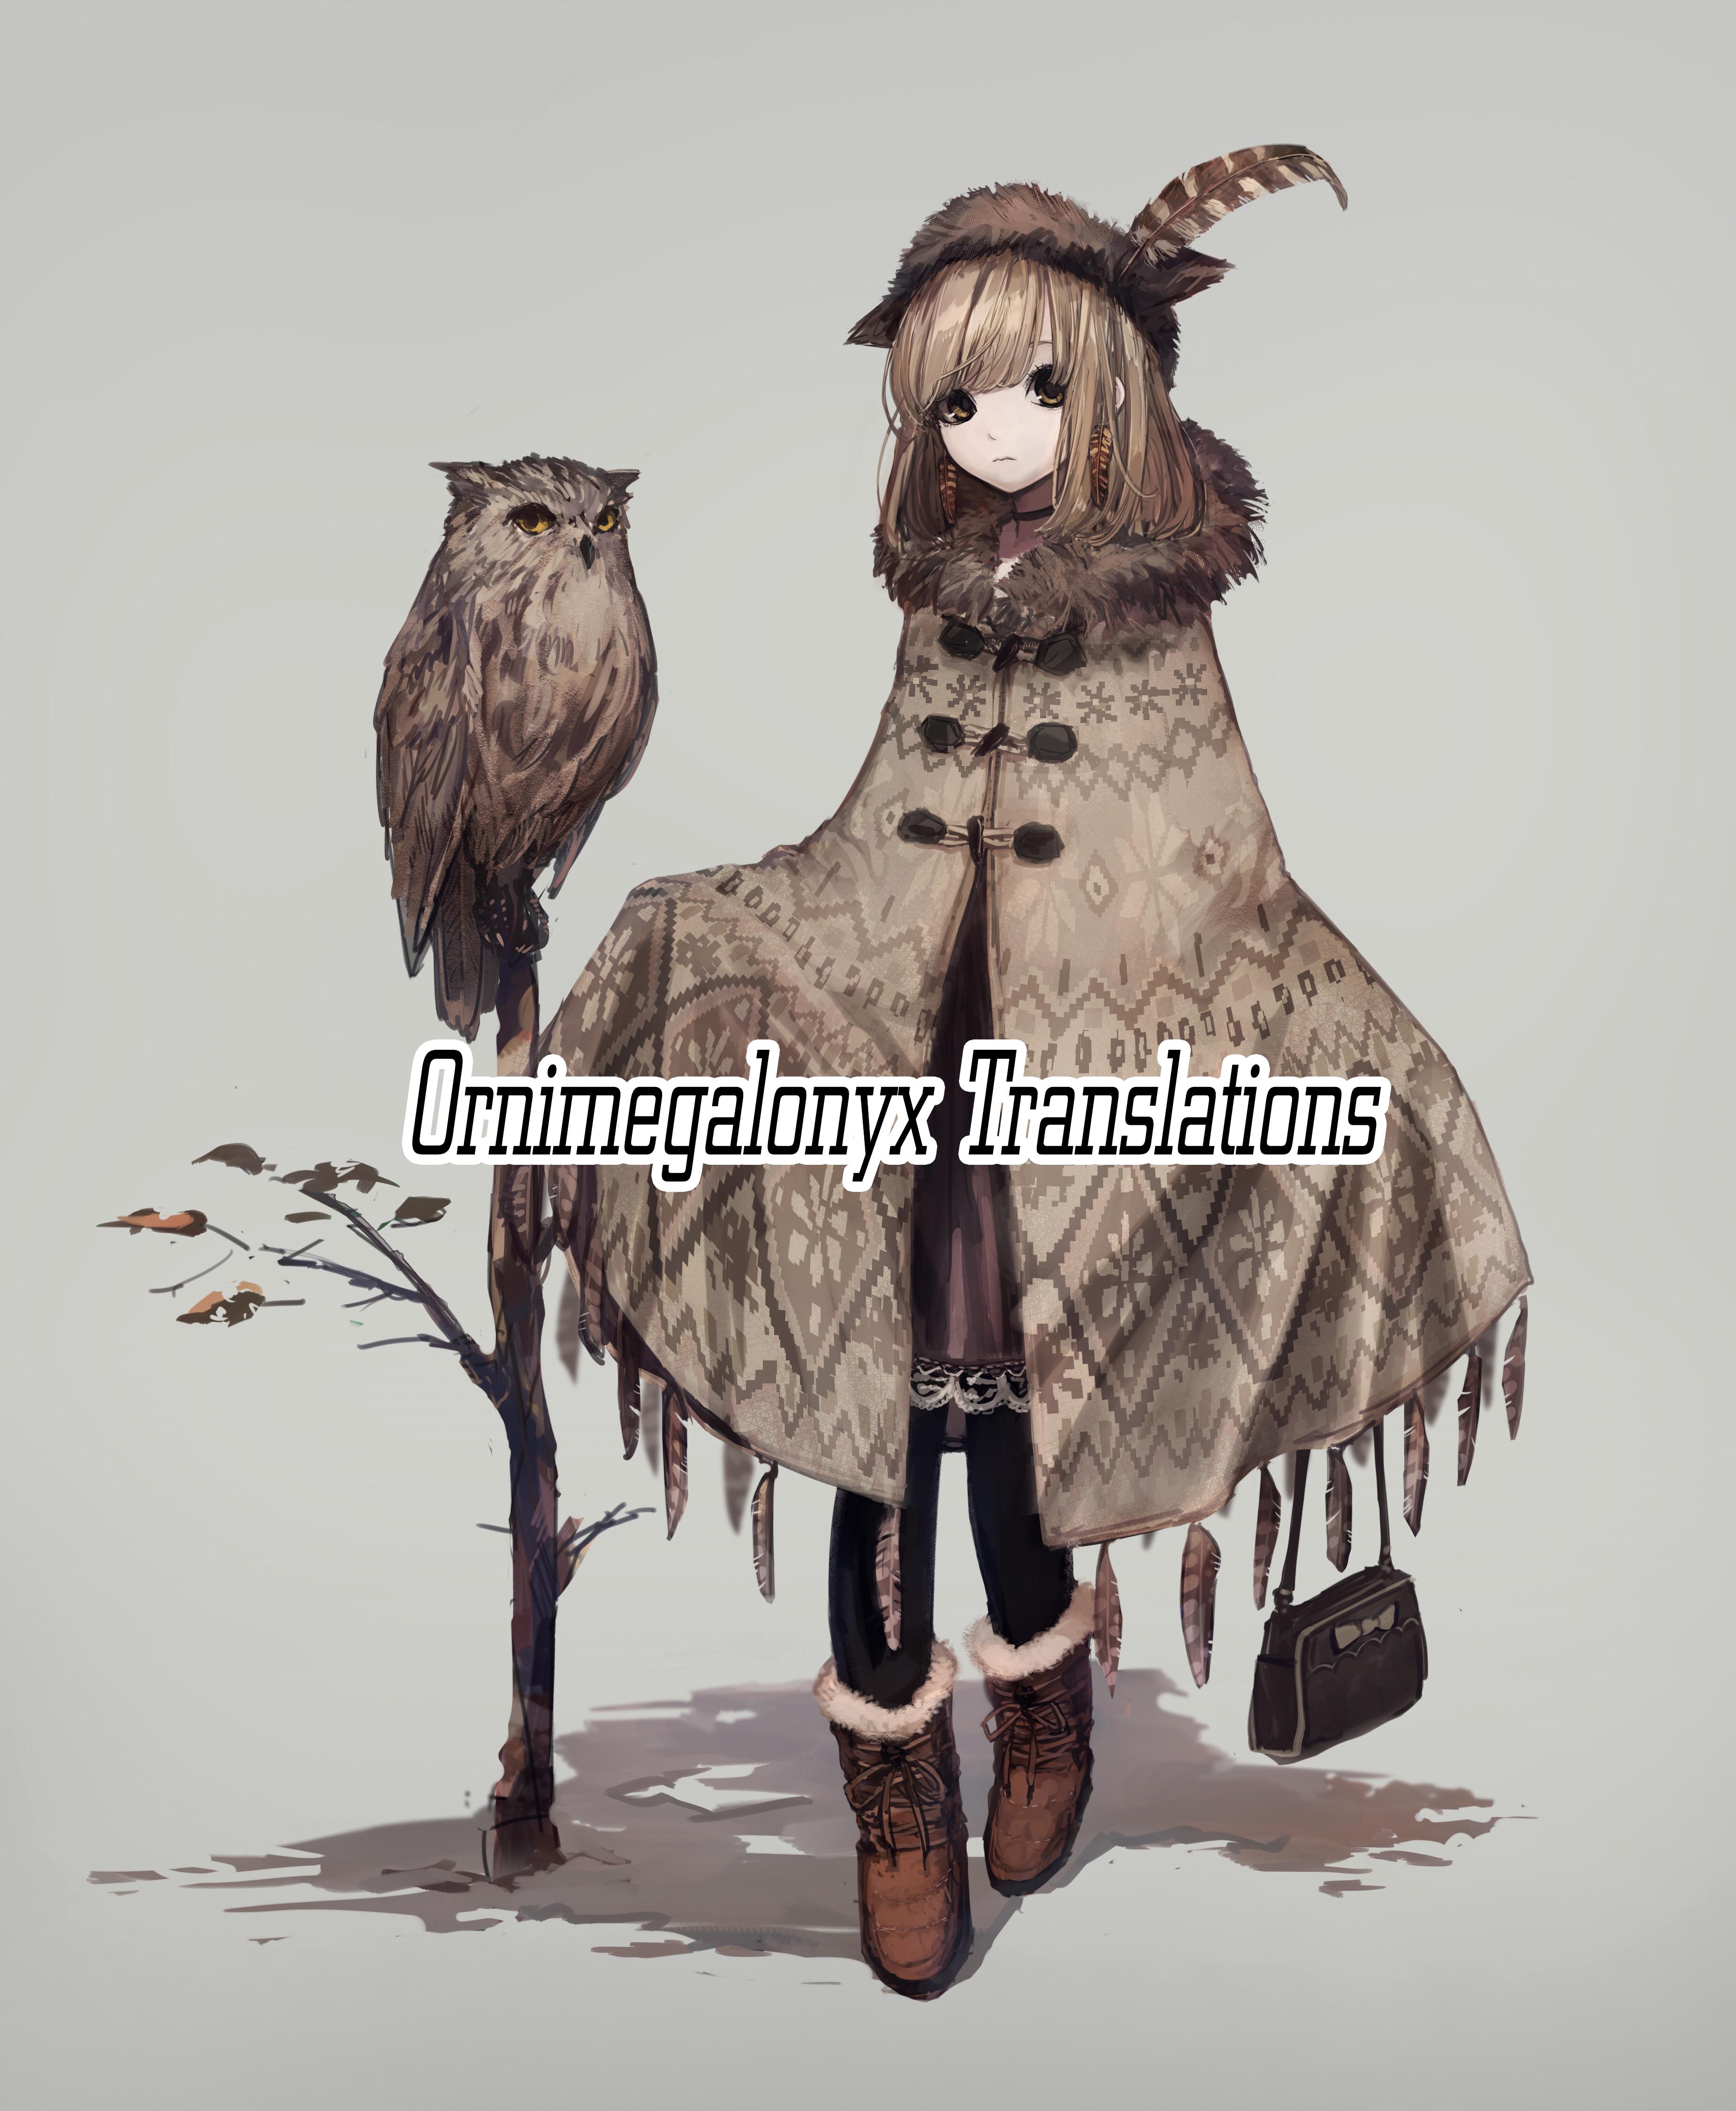 Ornimegalonyx Translations